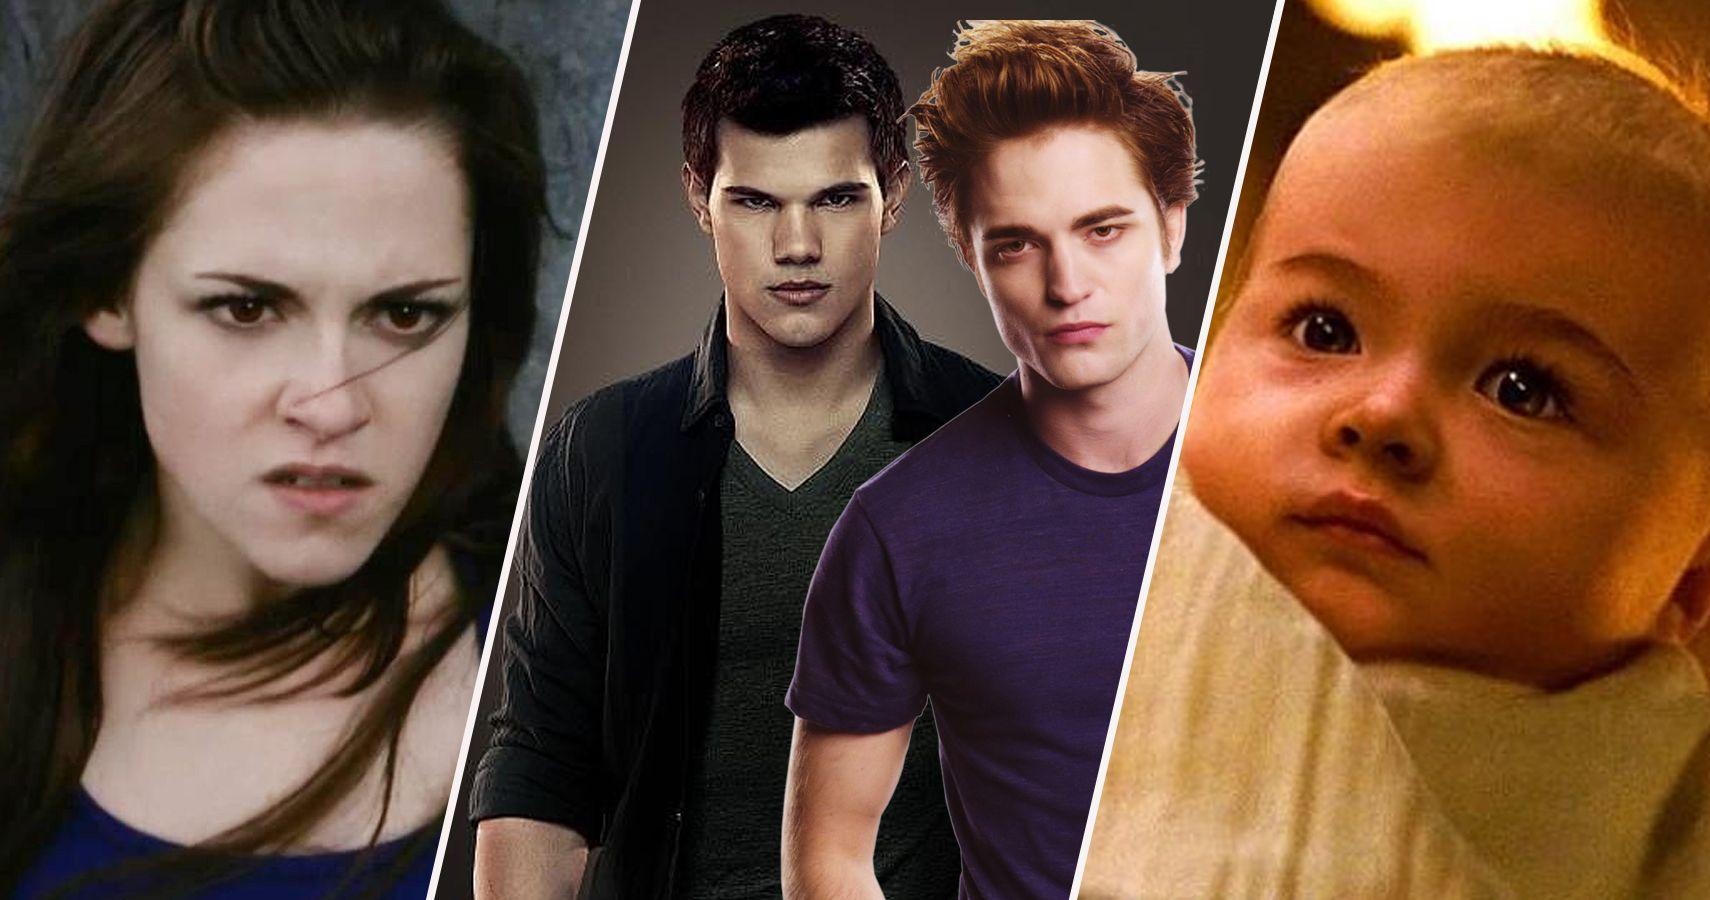 Twilight: 20 Revelations About Edward And Jacob's Relationship